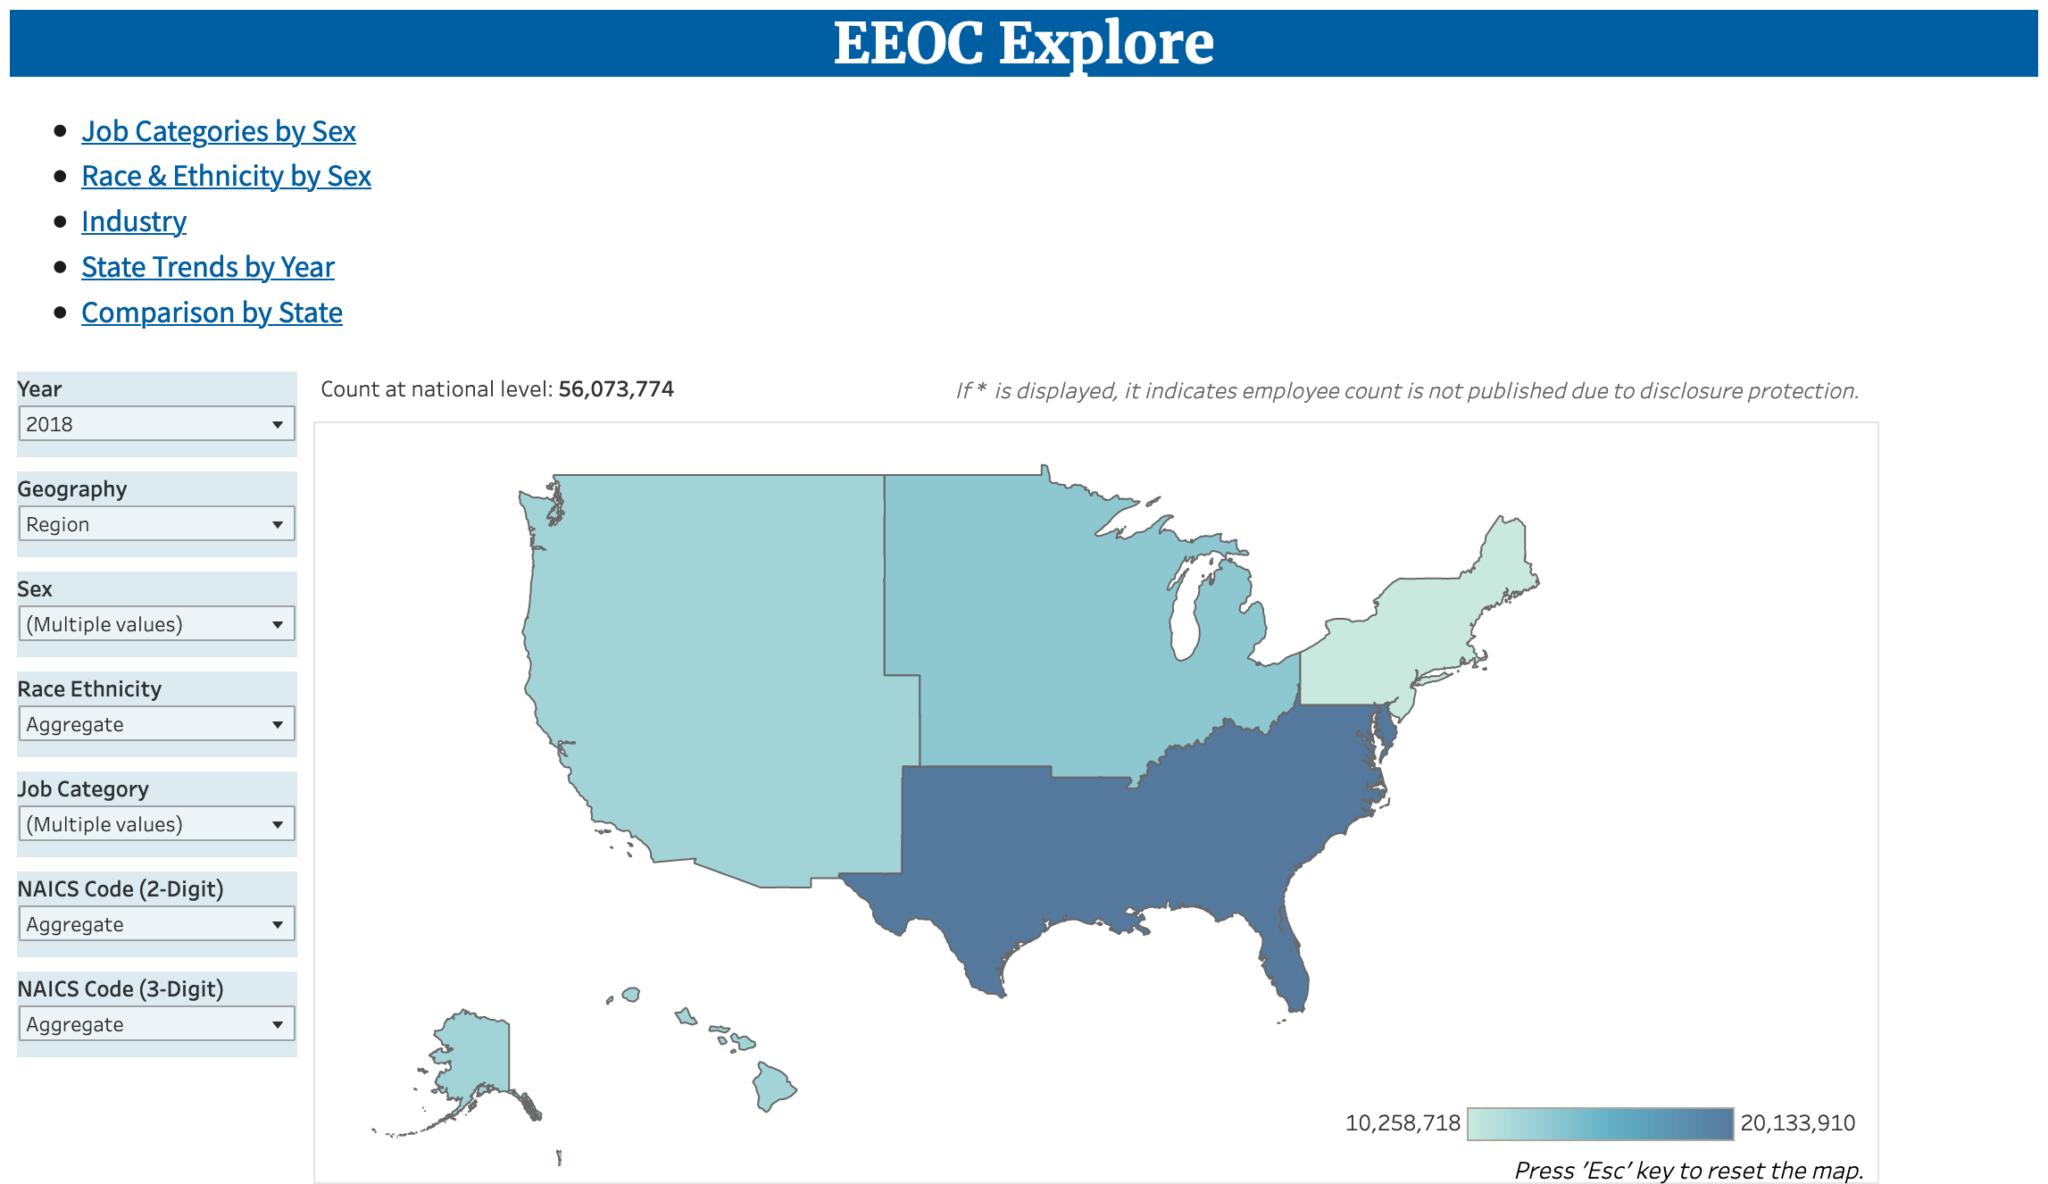 Screenshot of the new EEOC Explore employment data tool